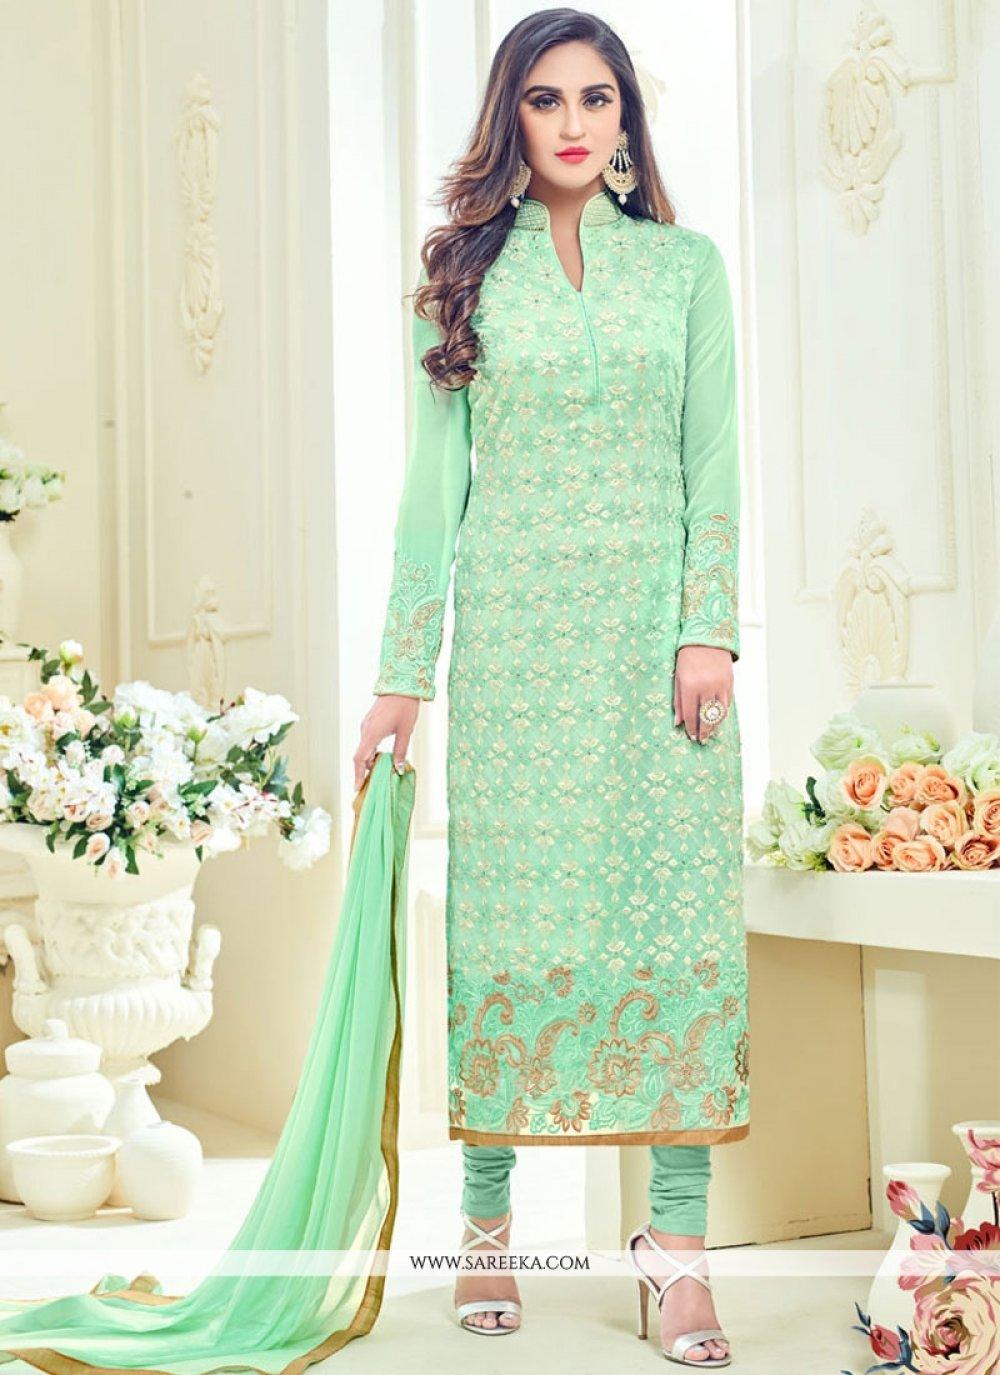 Krystle Dsouza Faux Georgette Sea Green Churidar Designer Suit